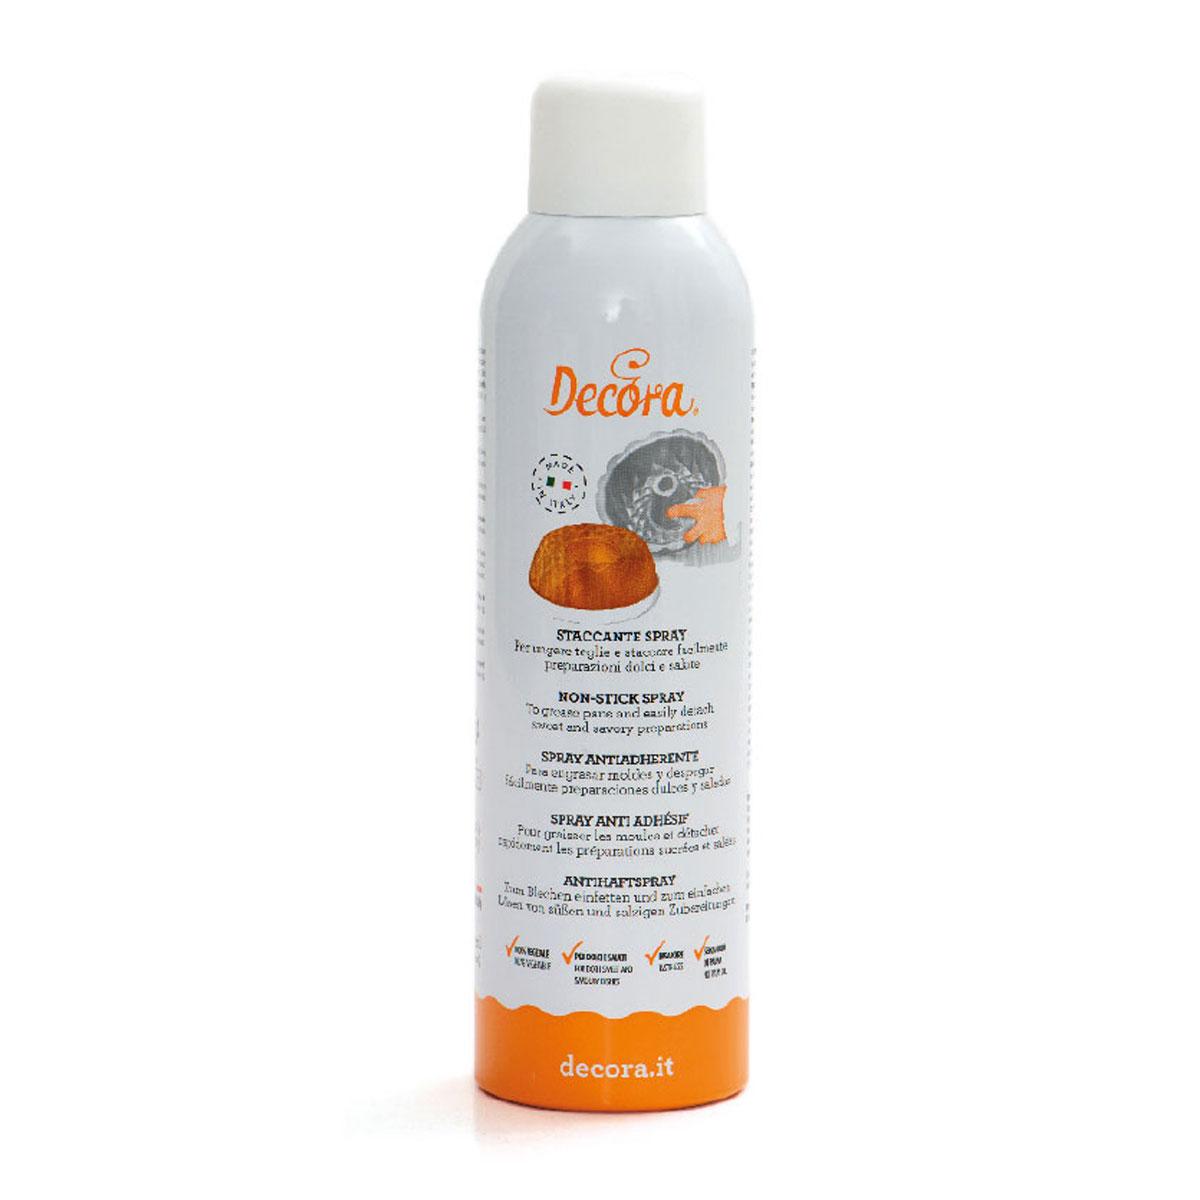 Decora Backtrennspray - Antihaftspray 250ml